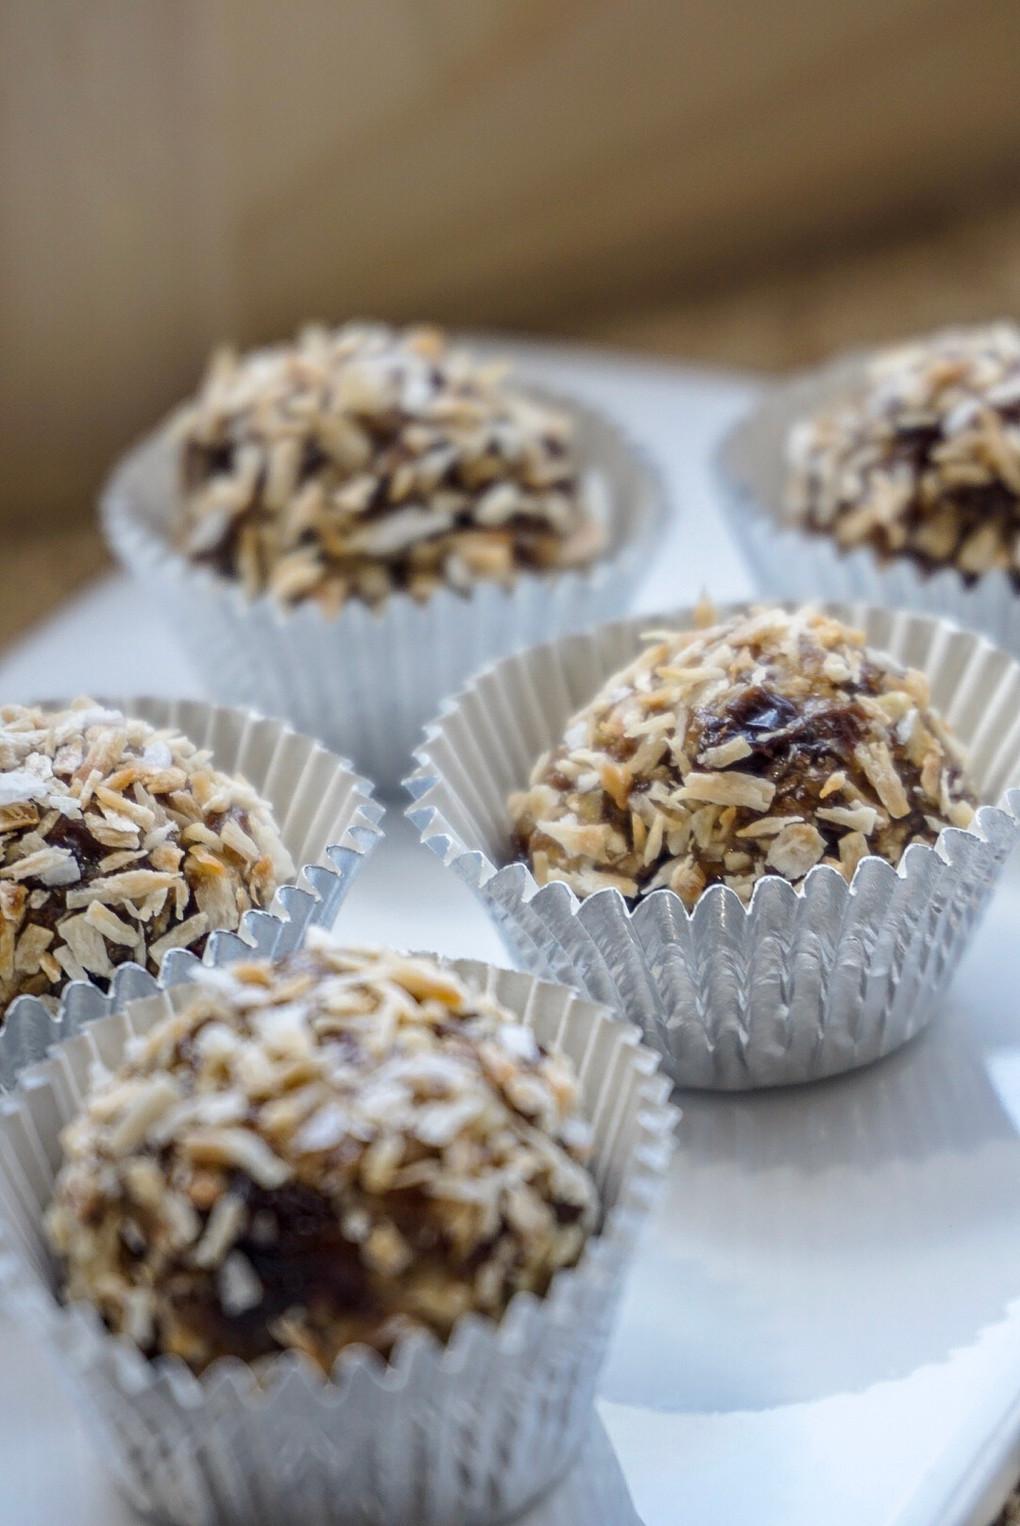 Easy Healthy Recipes Using California Raisins